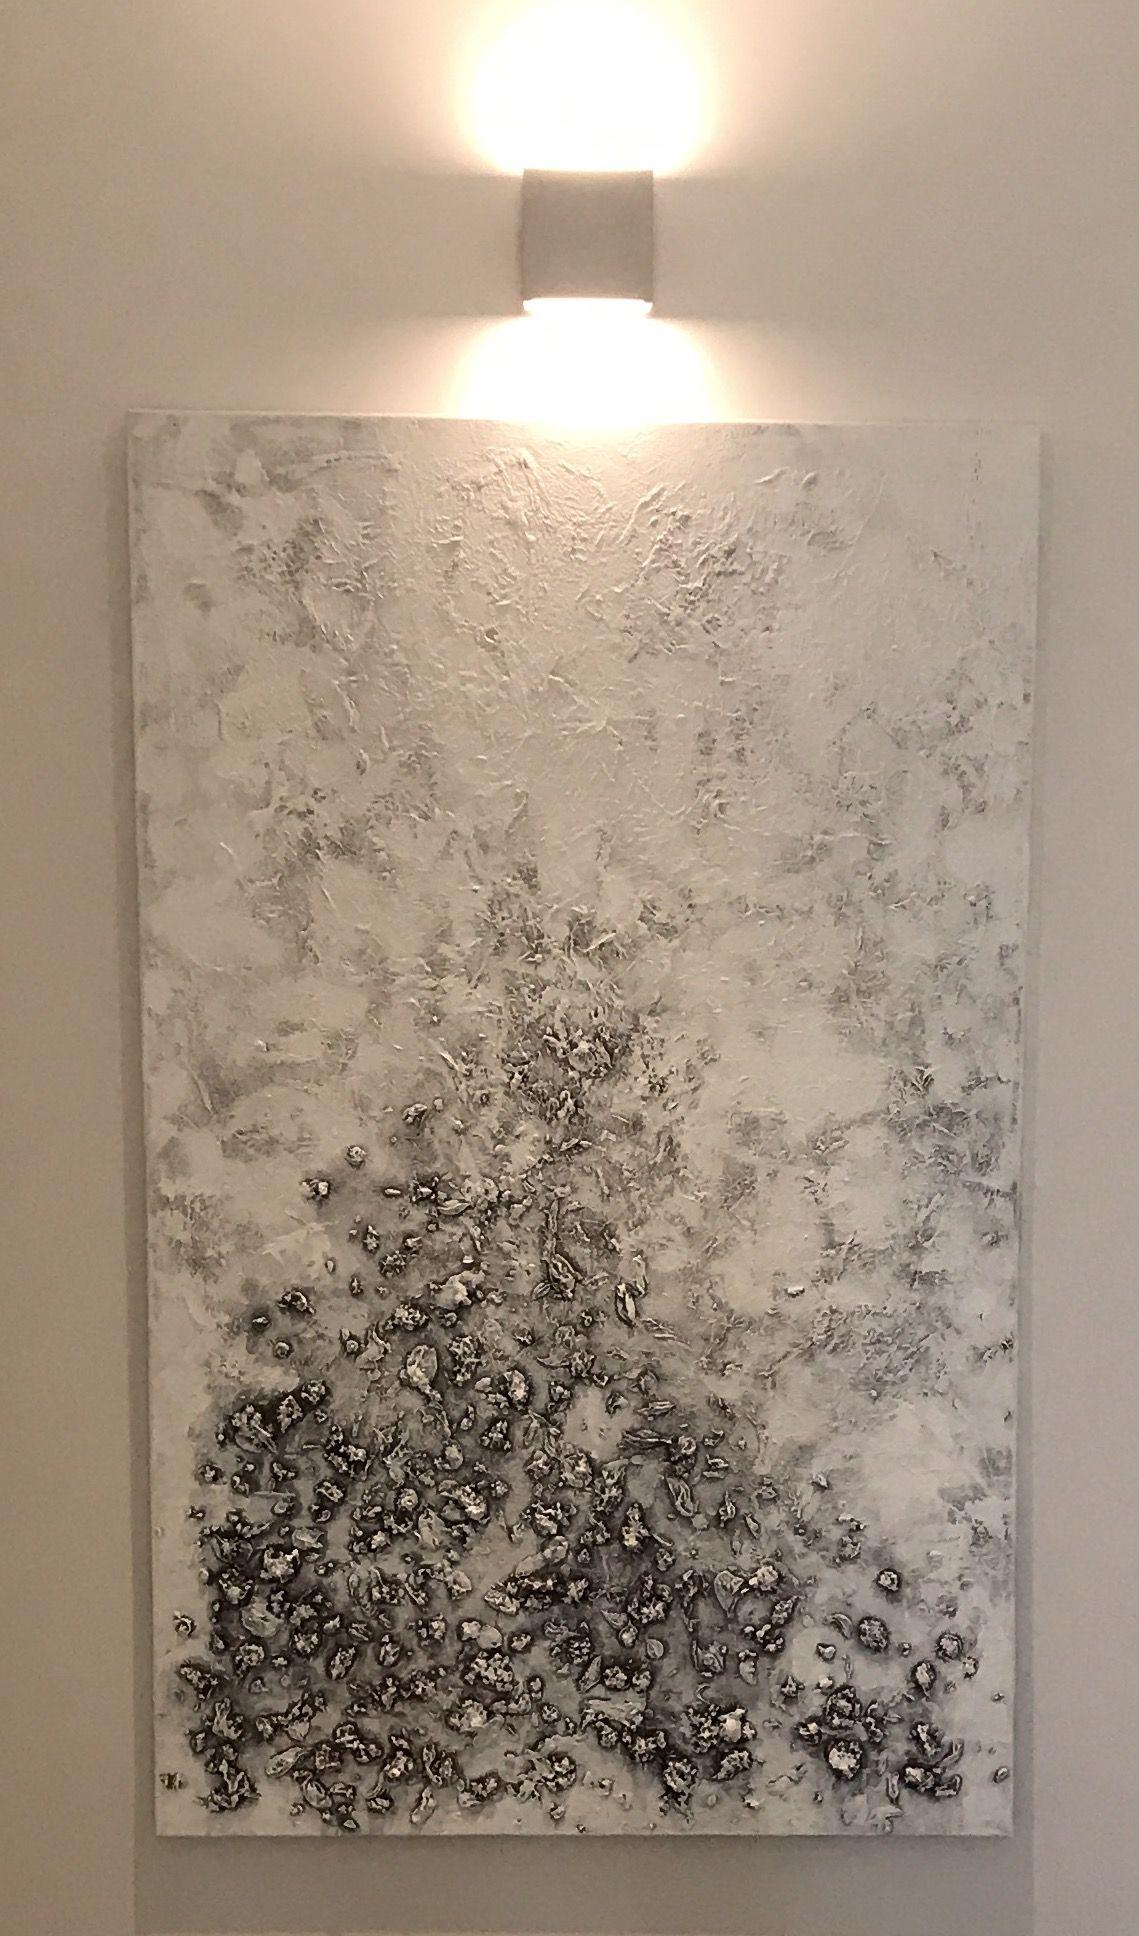 Pin Von Michaela Jellinek Auf Art Leinwand Acryl Abstrakt